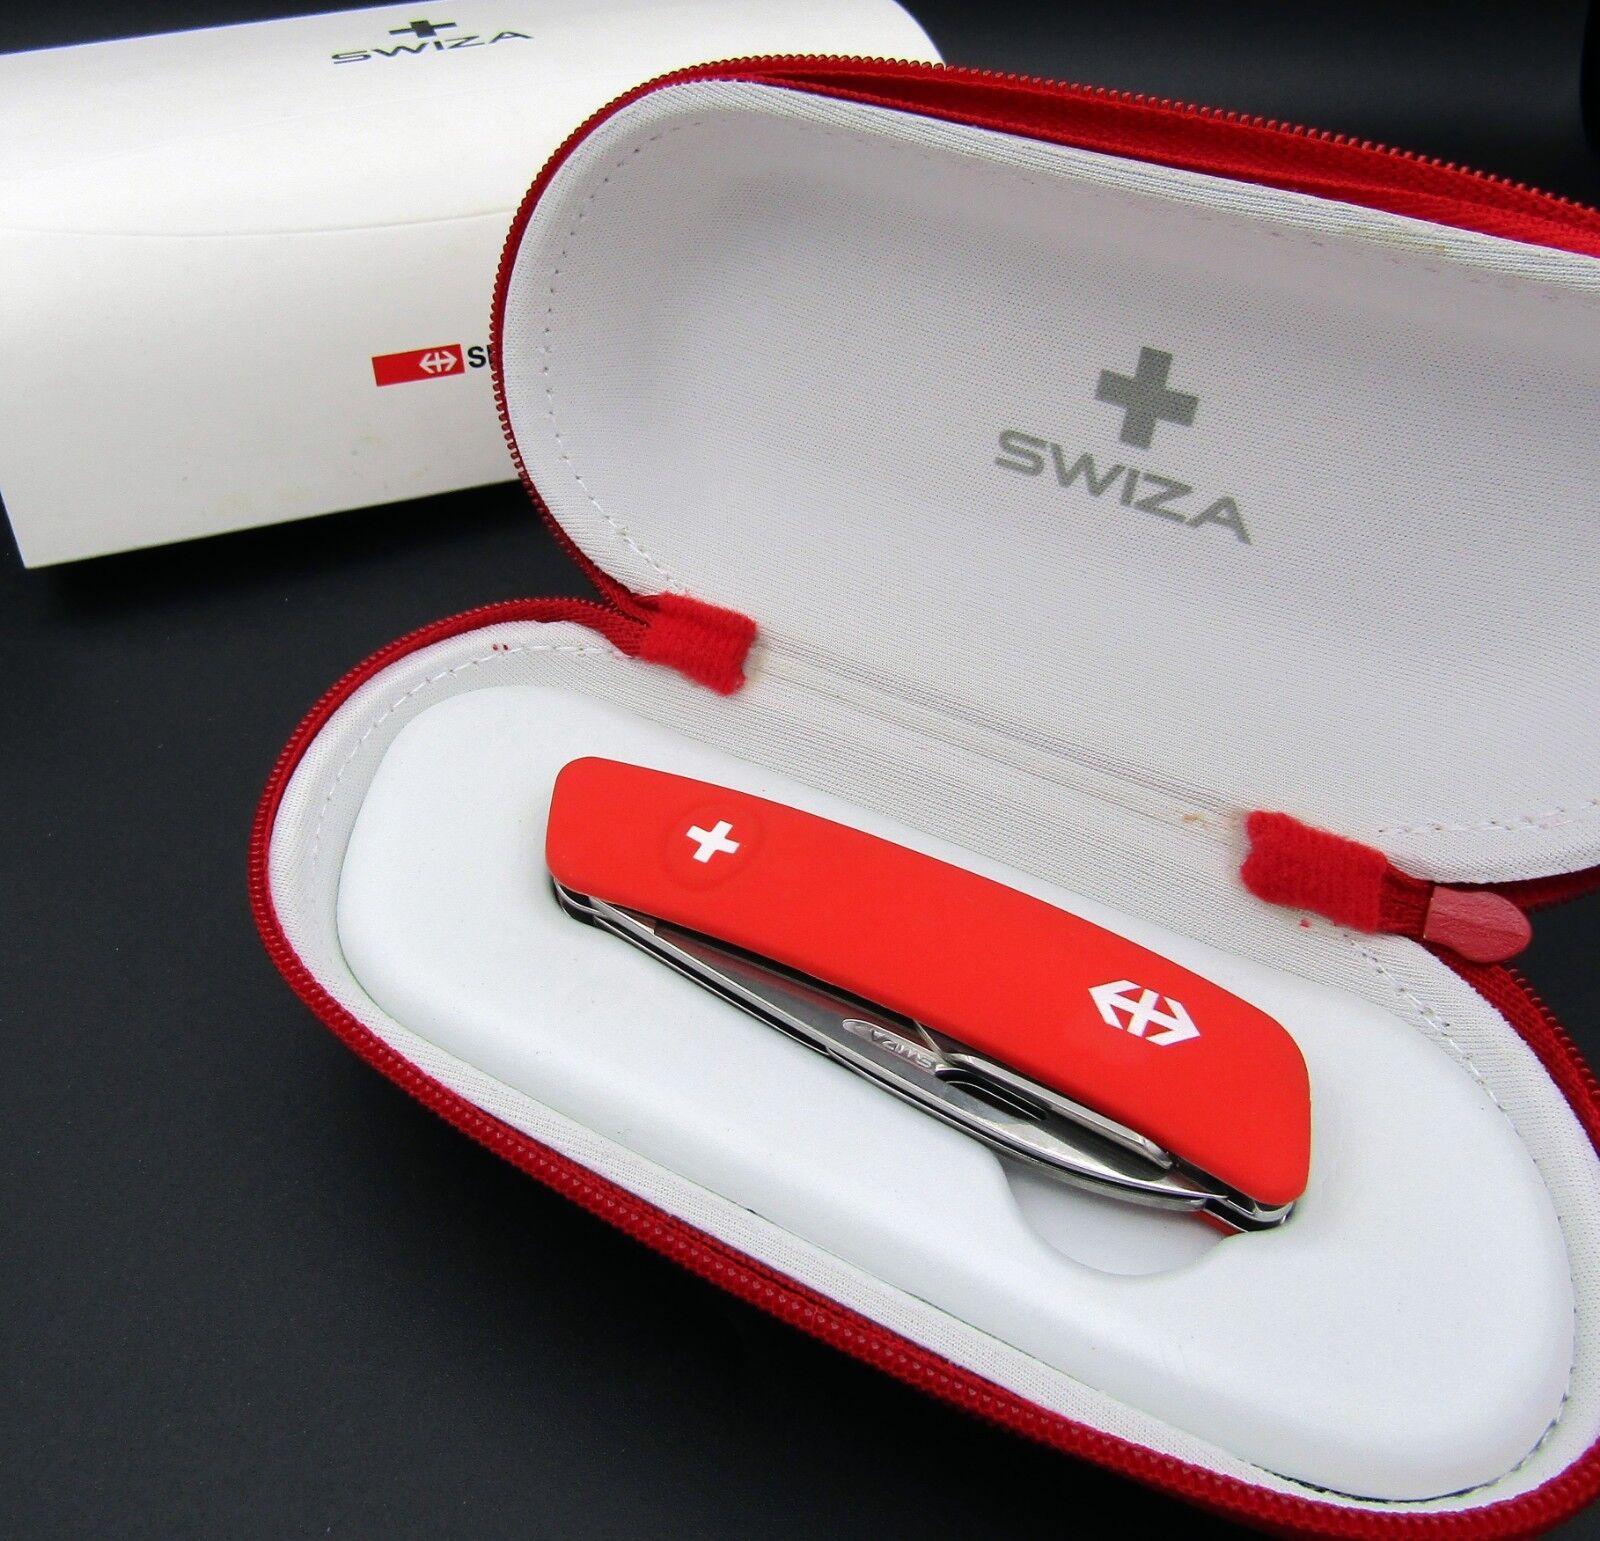 El nuevo navaja suiza, Swiza, Swiza, Swiza, d03, SBB Edition, Swiss Army Knife a29229